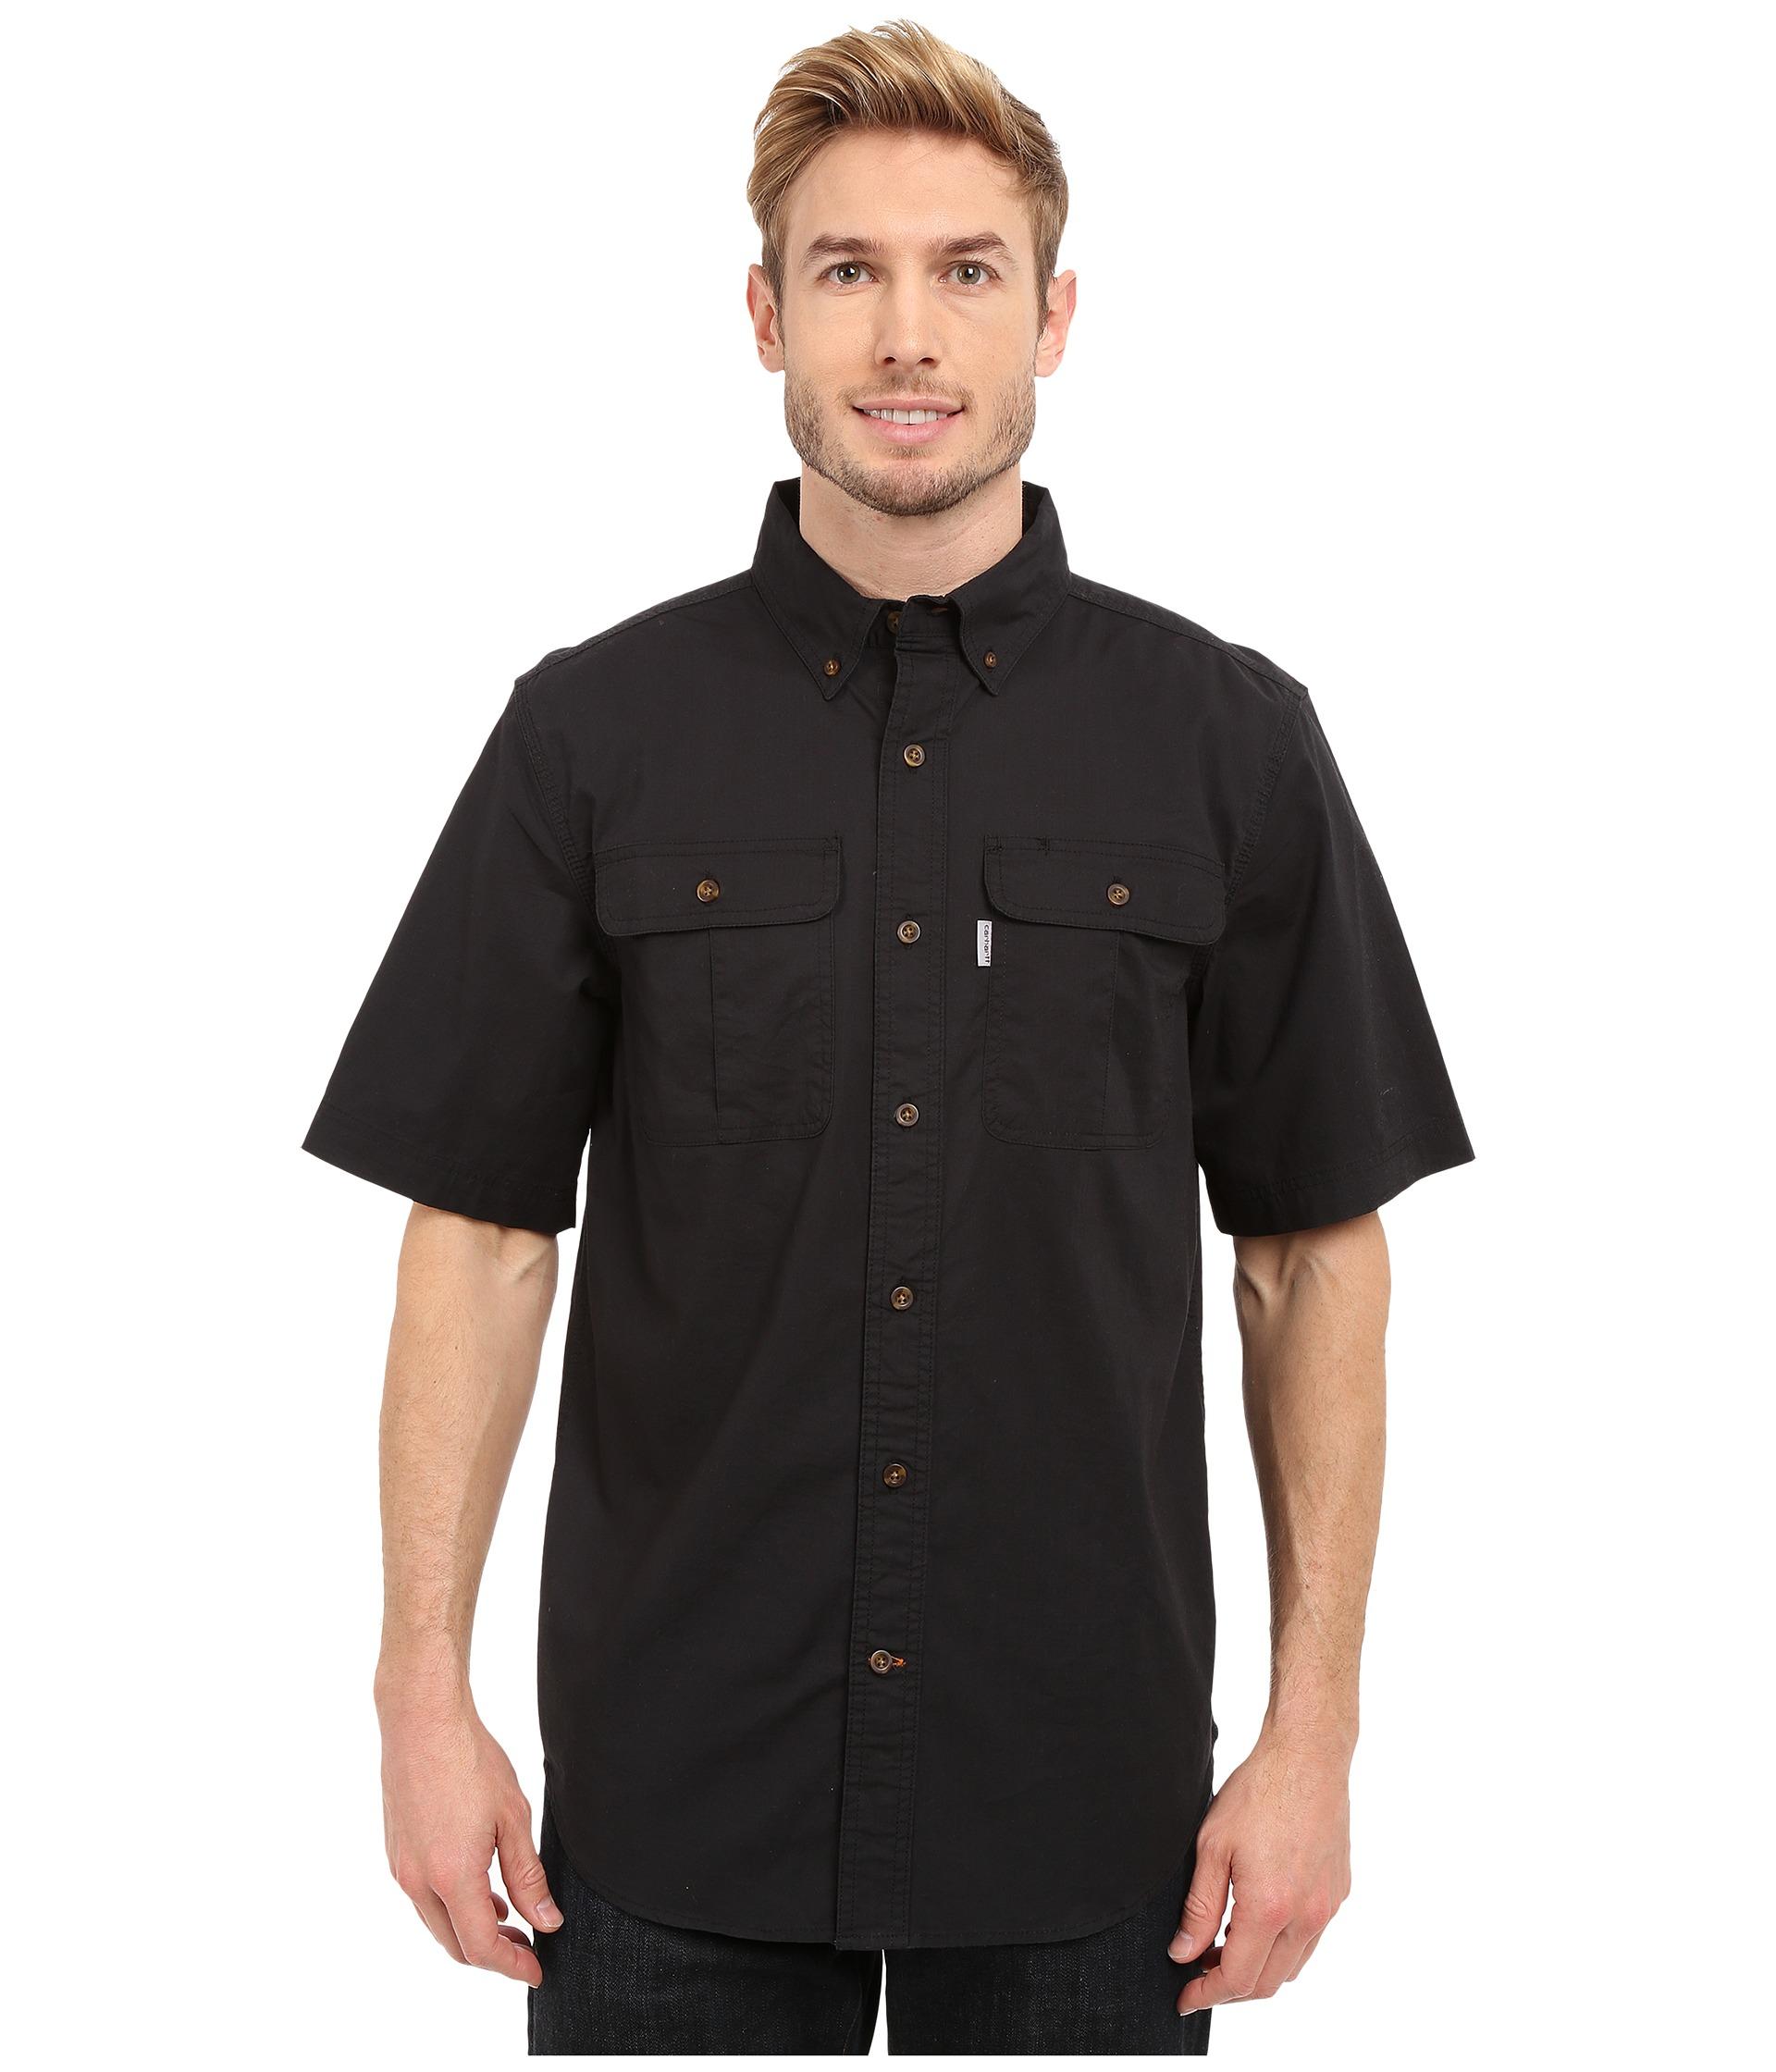 Carhartt Foreman Solid Short Sleeve Work Shirt Black